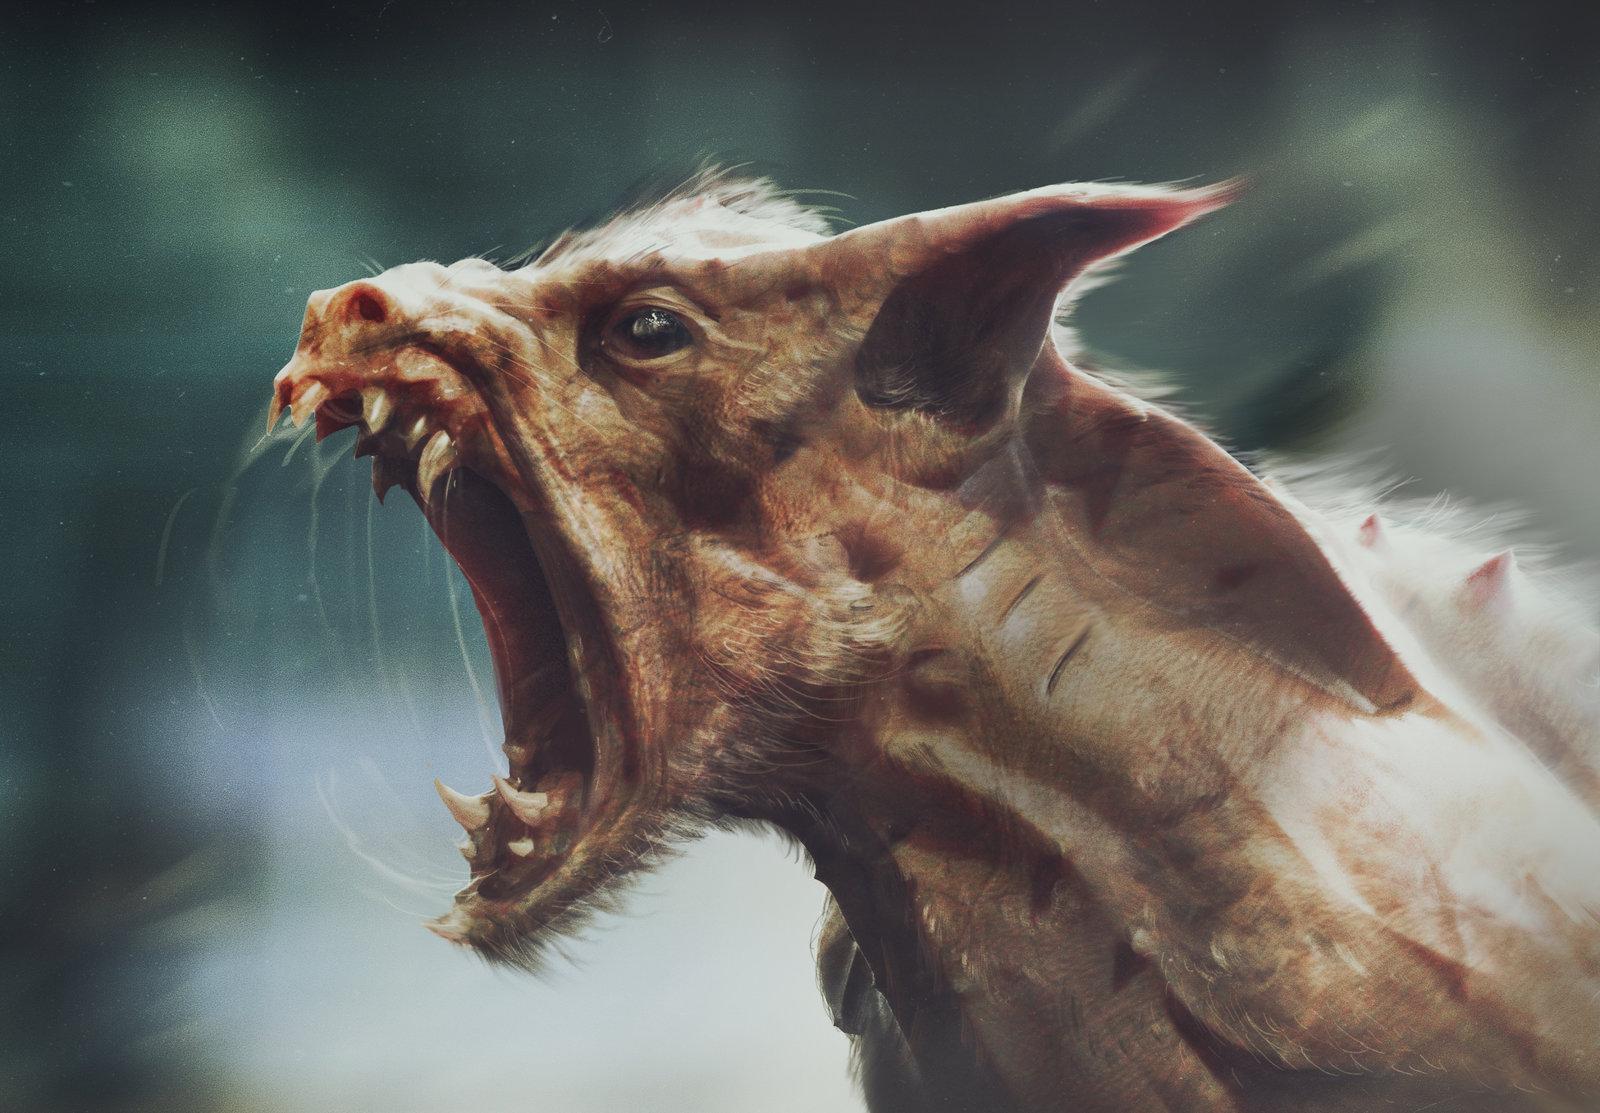 Ugly mutation